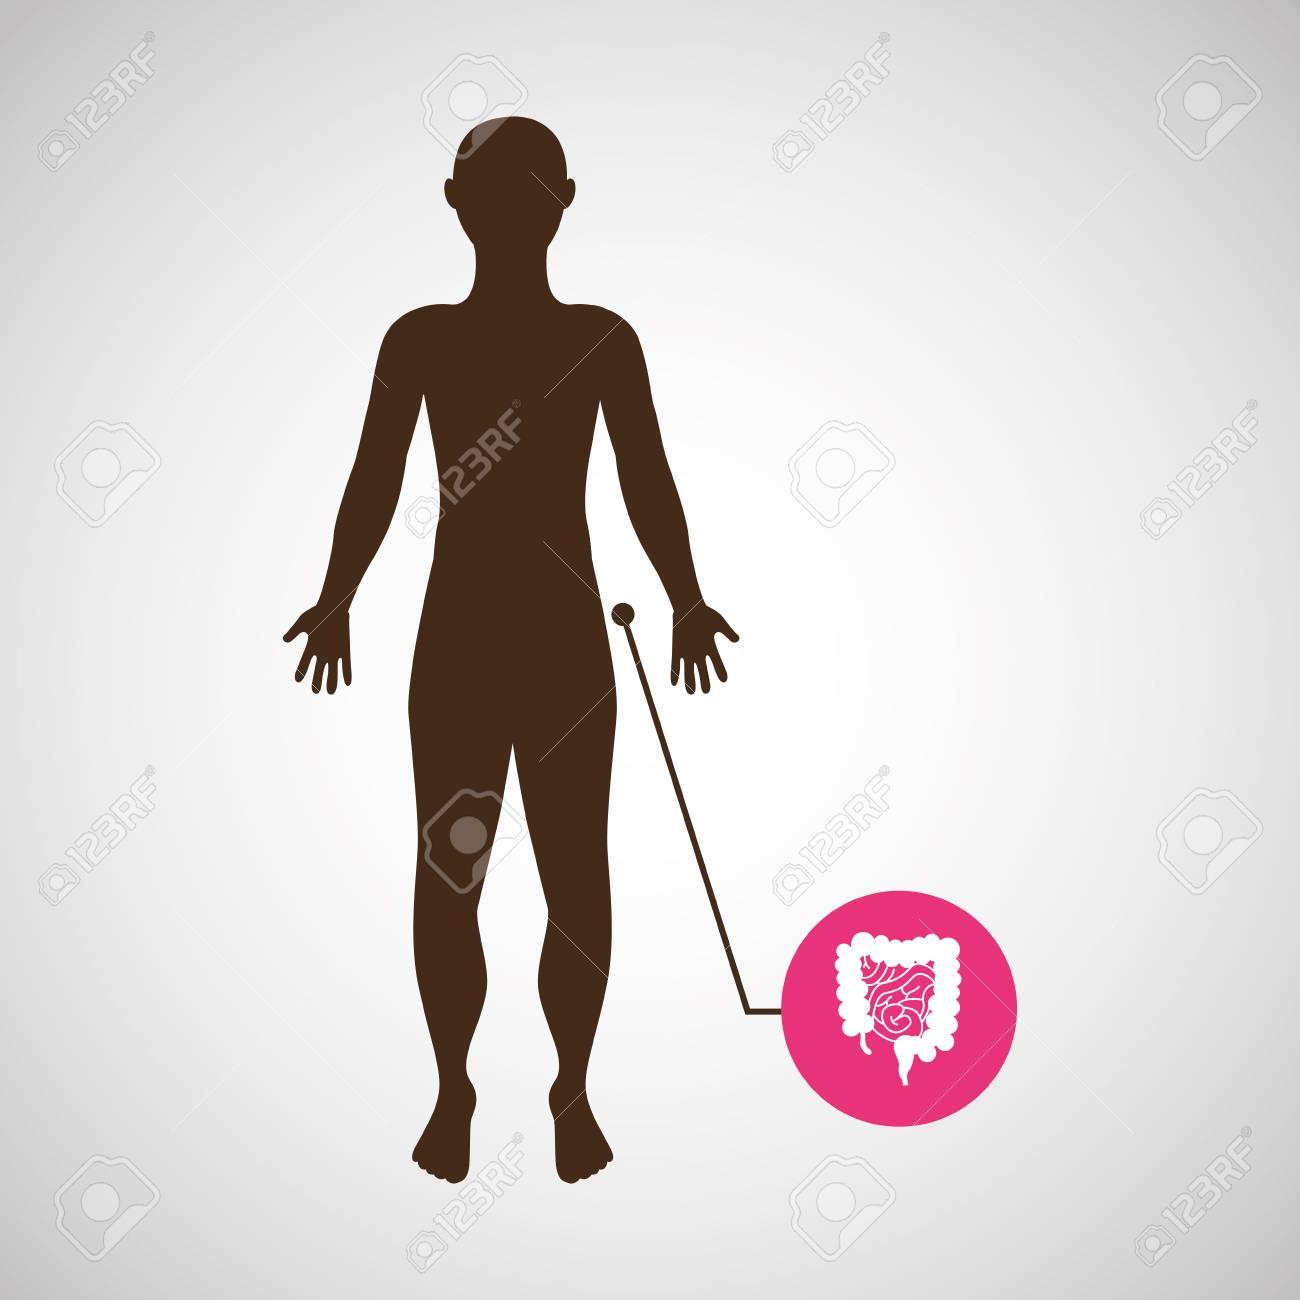 Silhouette Mann Darm Anatomie Körpervektor Lizenzfrei Nutzbare ...